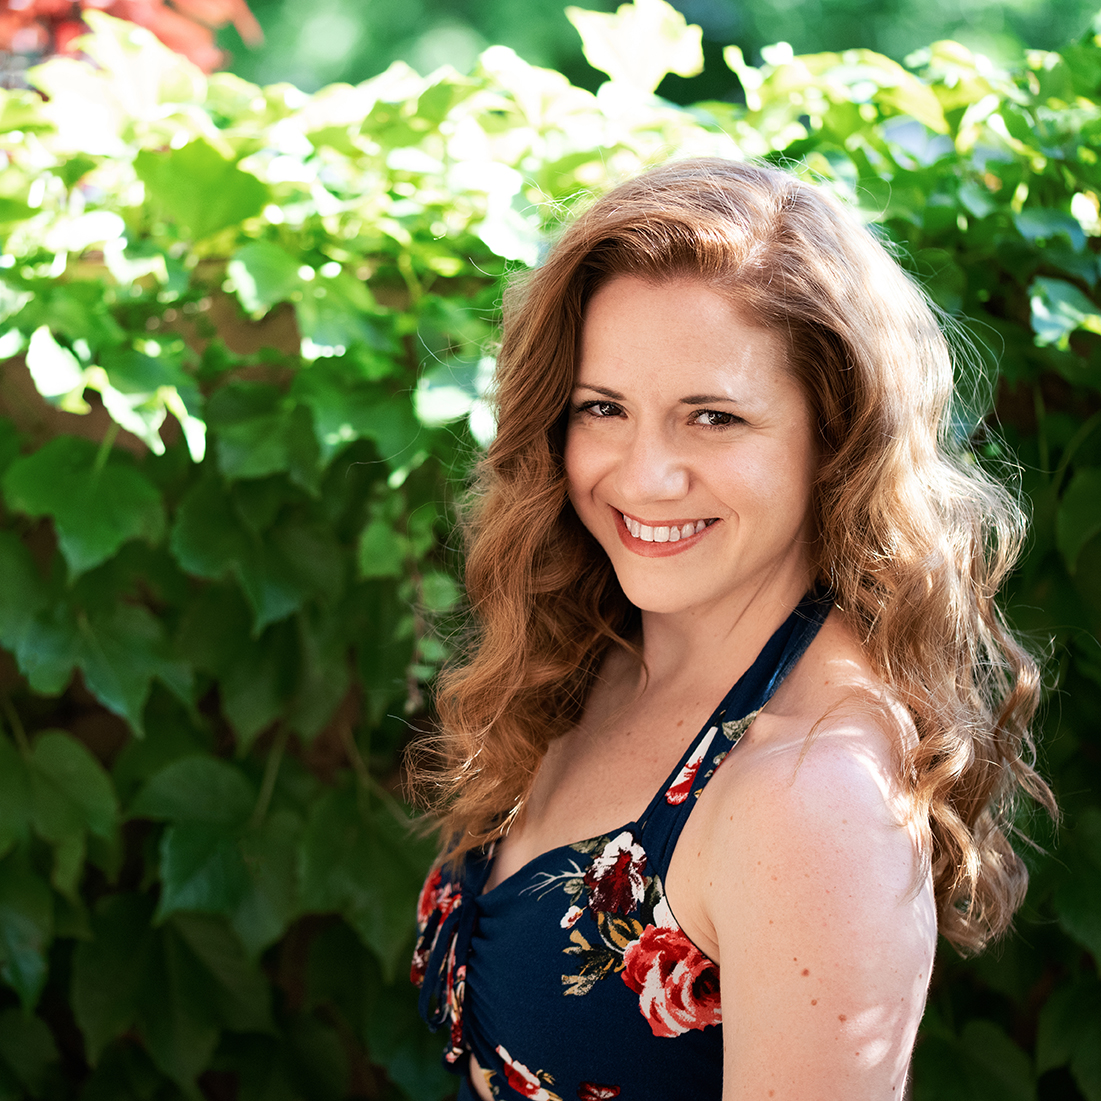 Sara Exley Santa Fe New Mexico Professional Business Portrait Headshot Head Shot Photography Photographer square